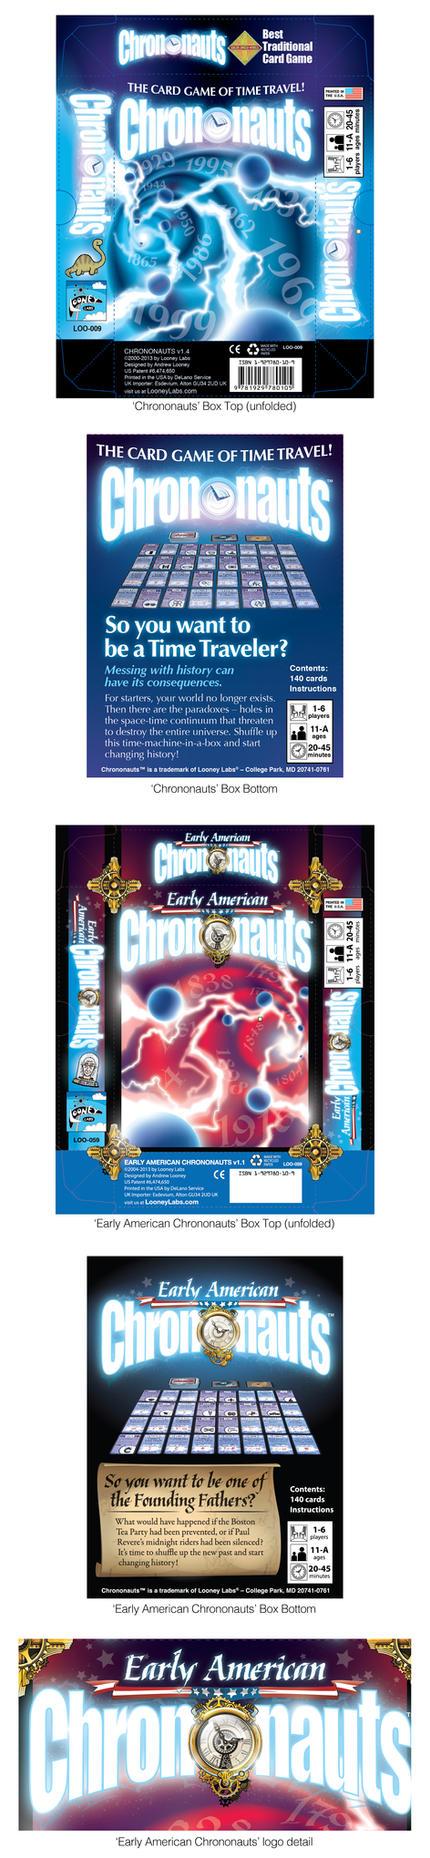 Chrononatus and Early American Chrononauts Rebrand by abnormalbrain